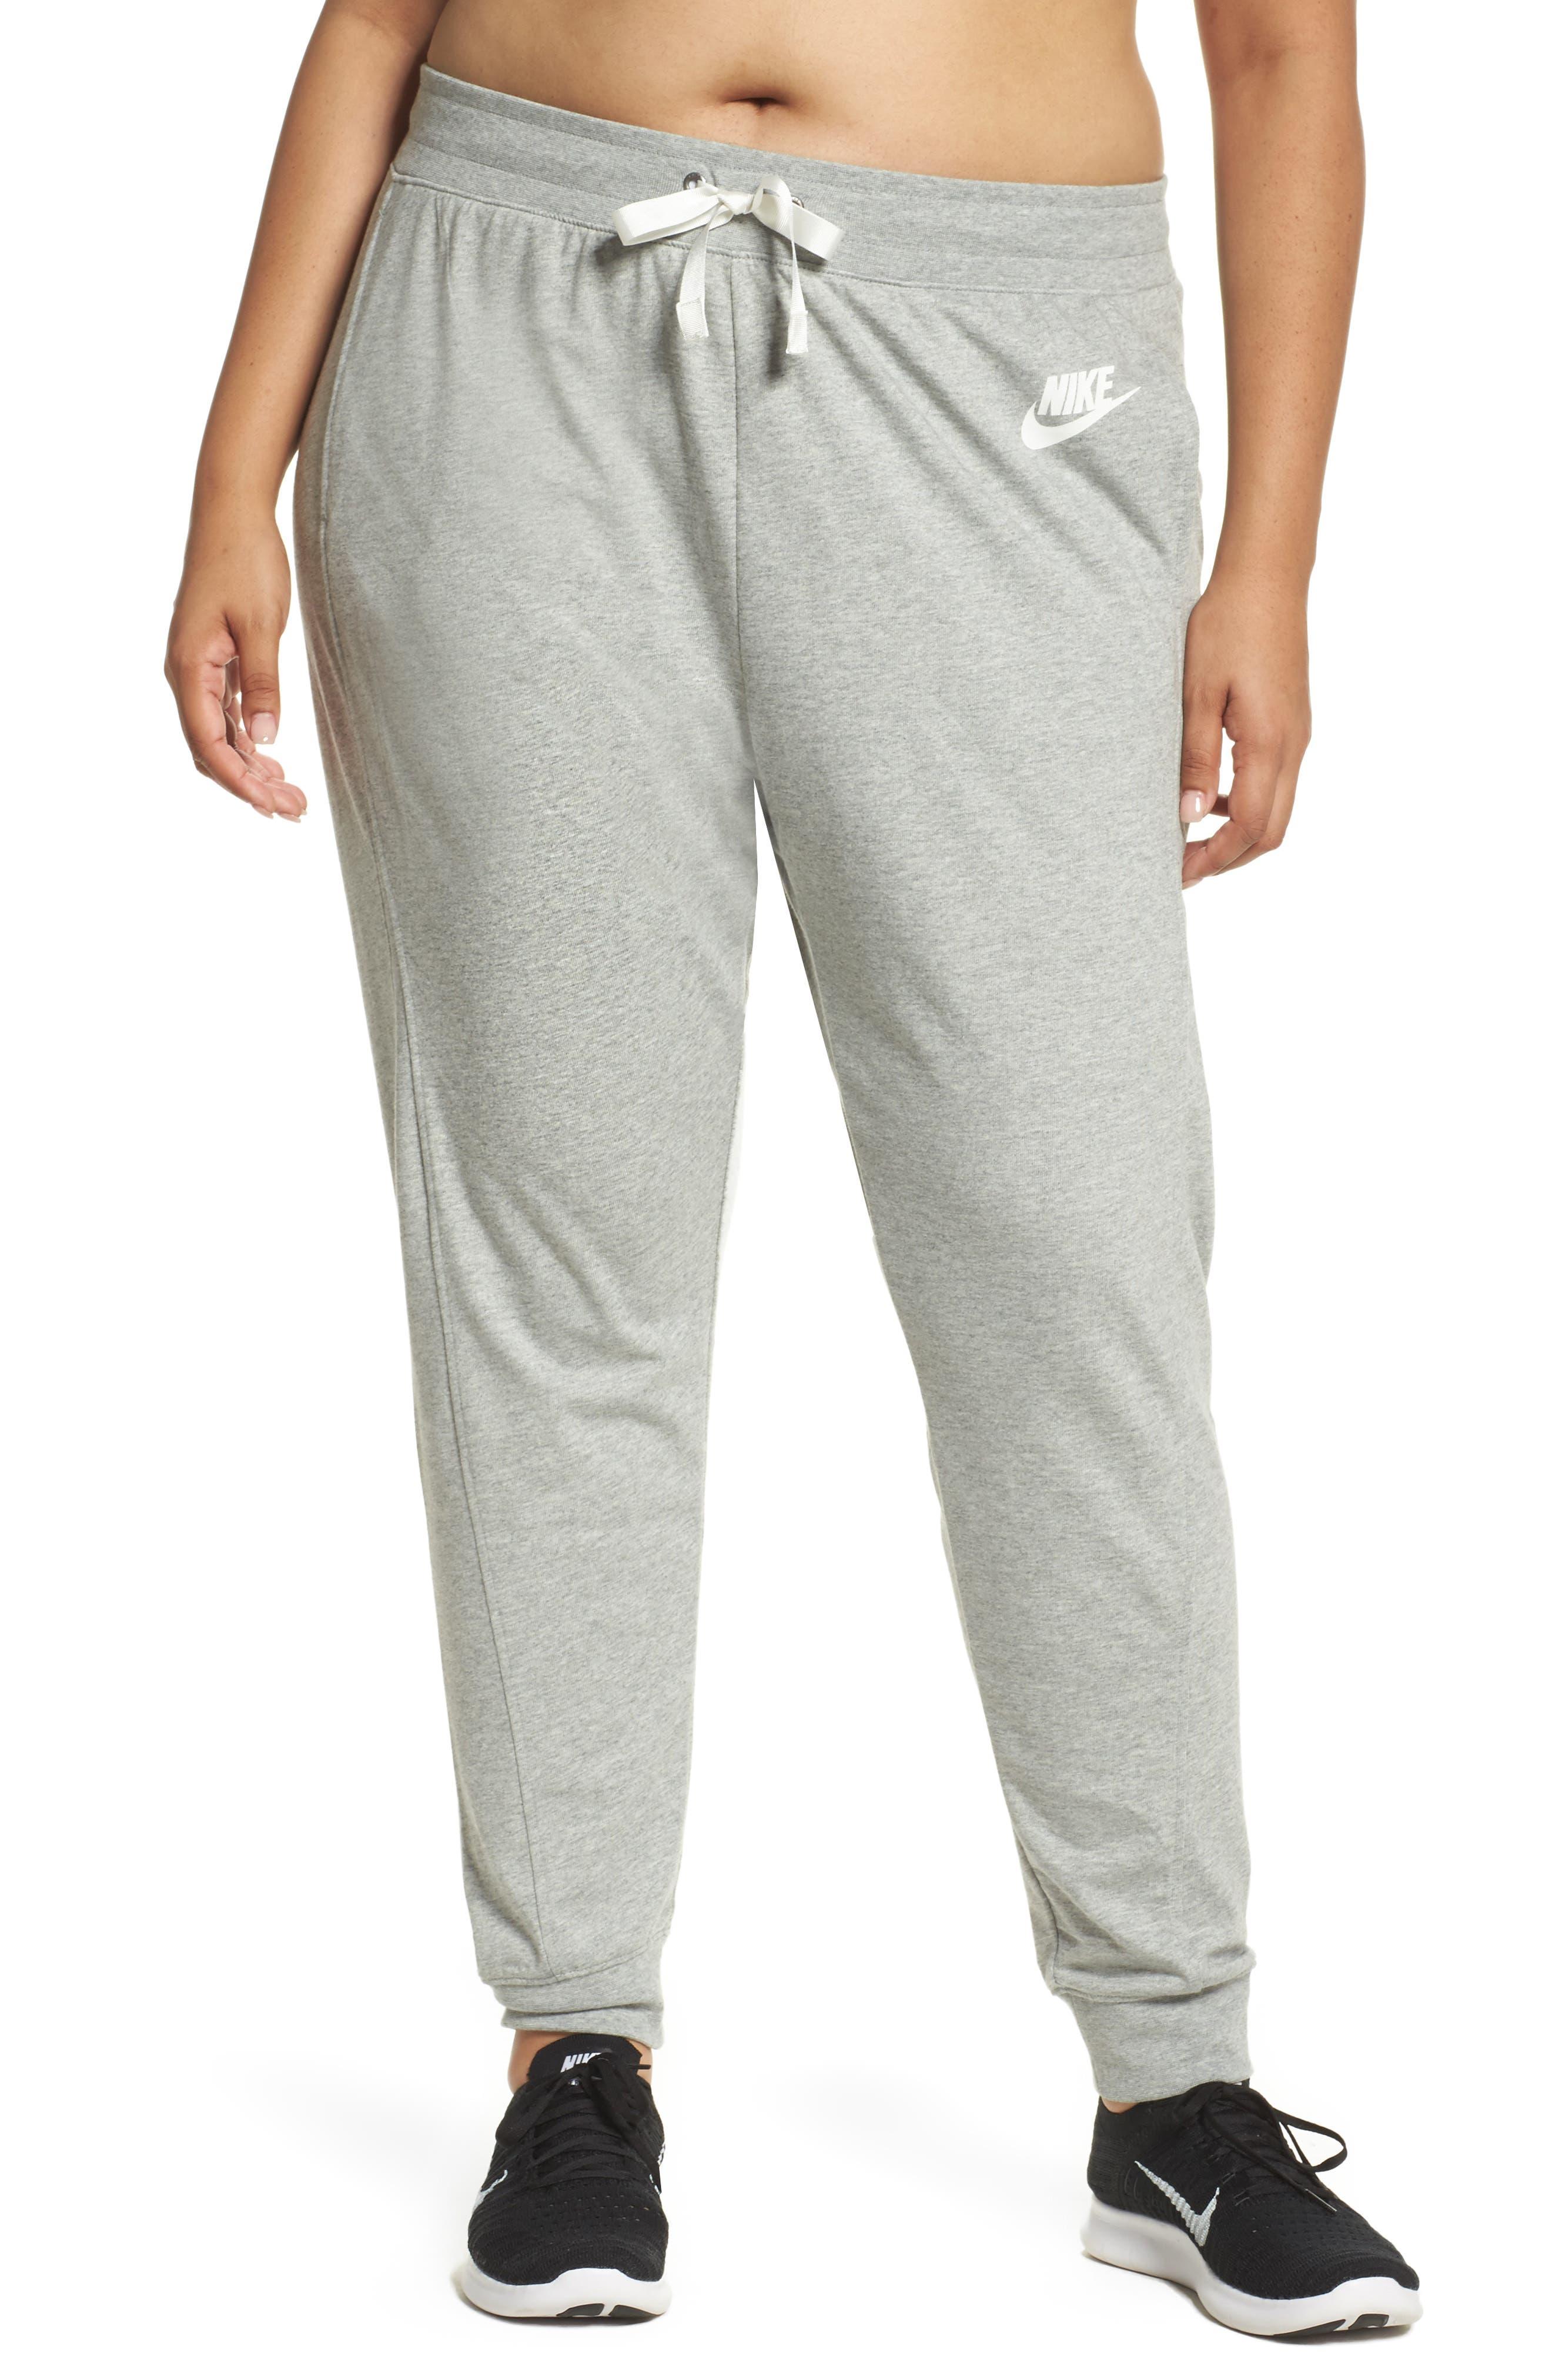 Sportswear Gym Classic Pants,                         Main,                         color, Dk Grey Heather/ Sail